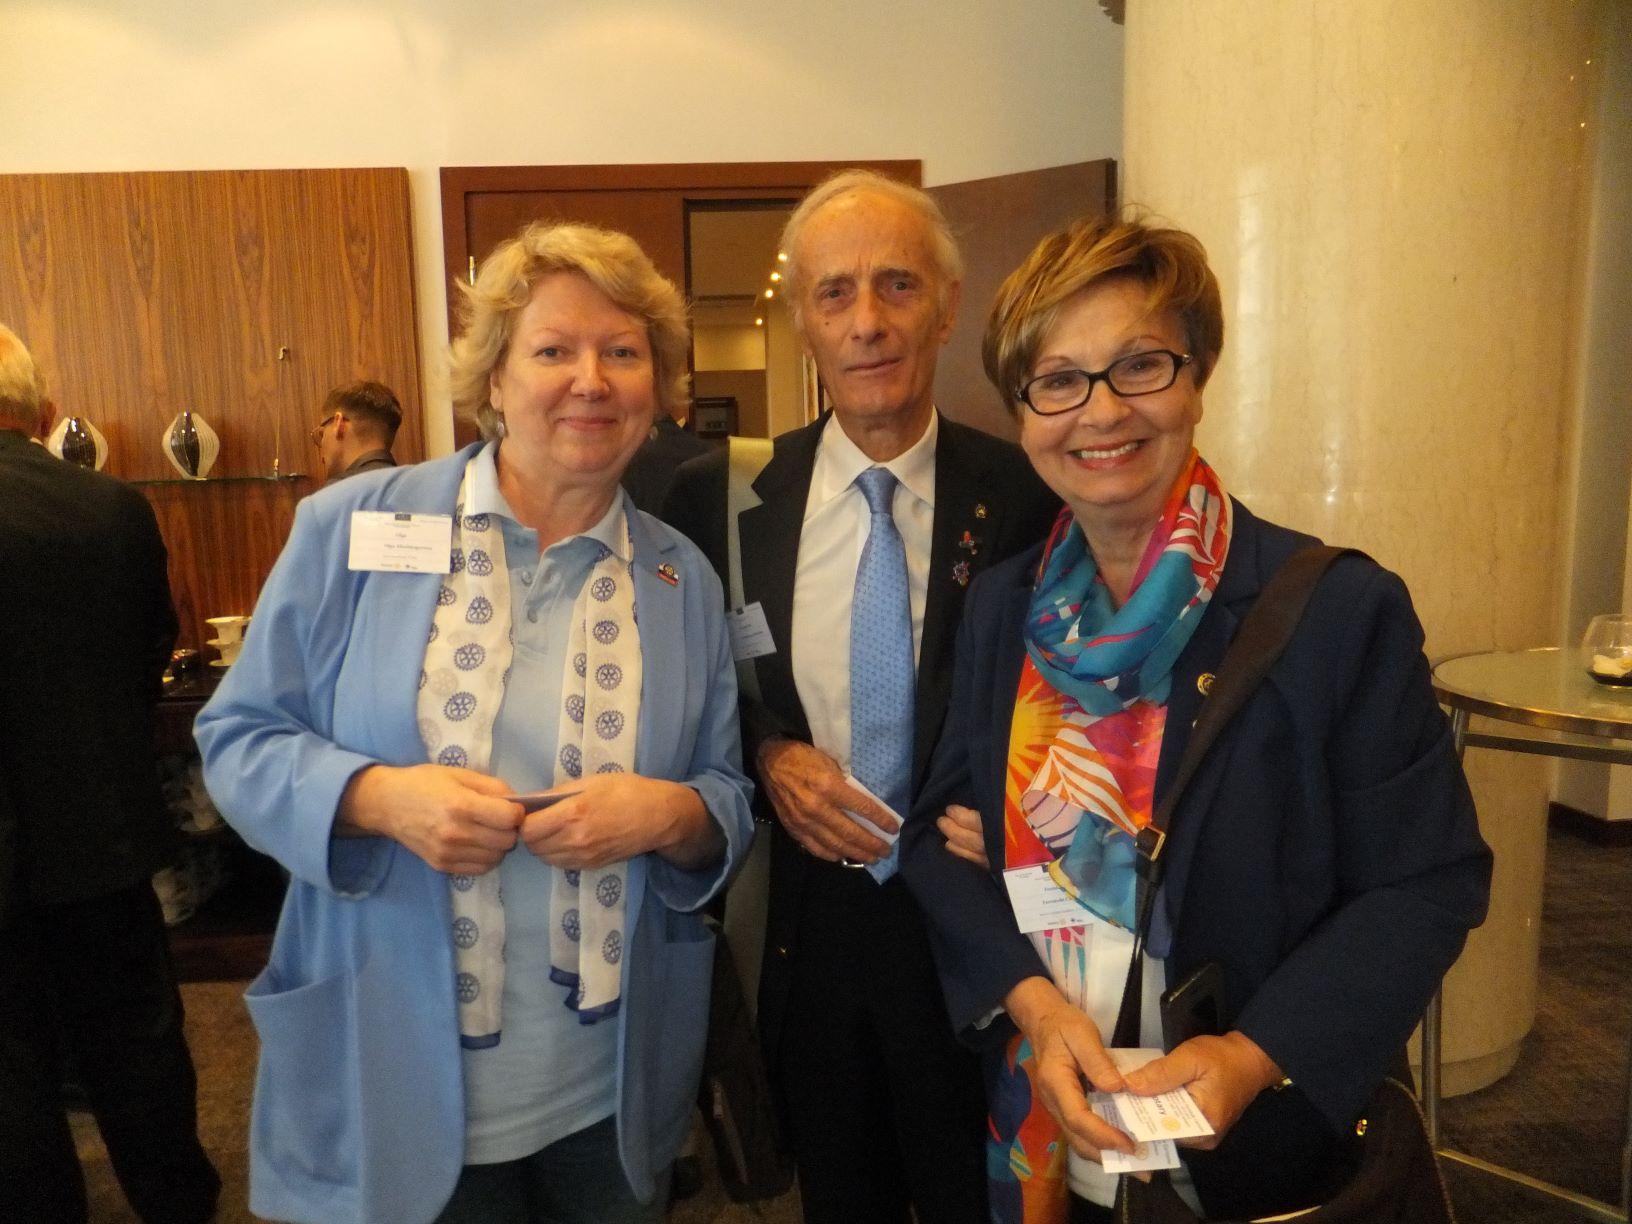 Olga/Carlogiorgio/Fernanda